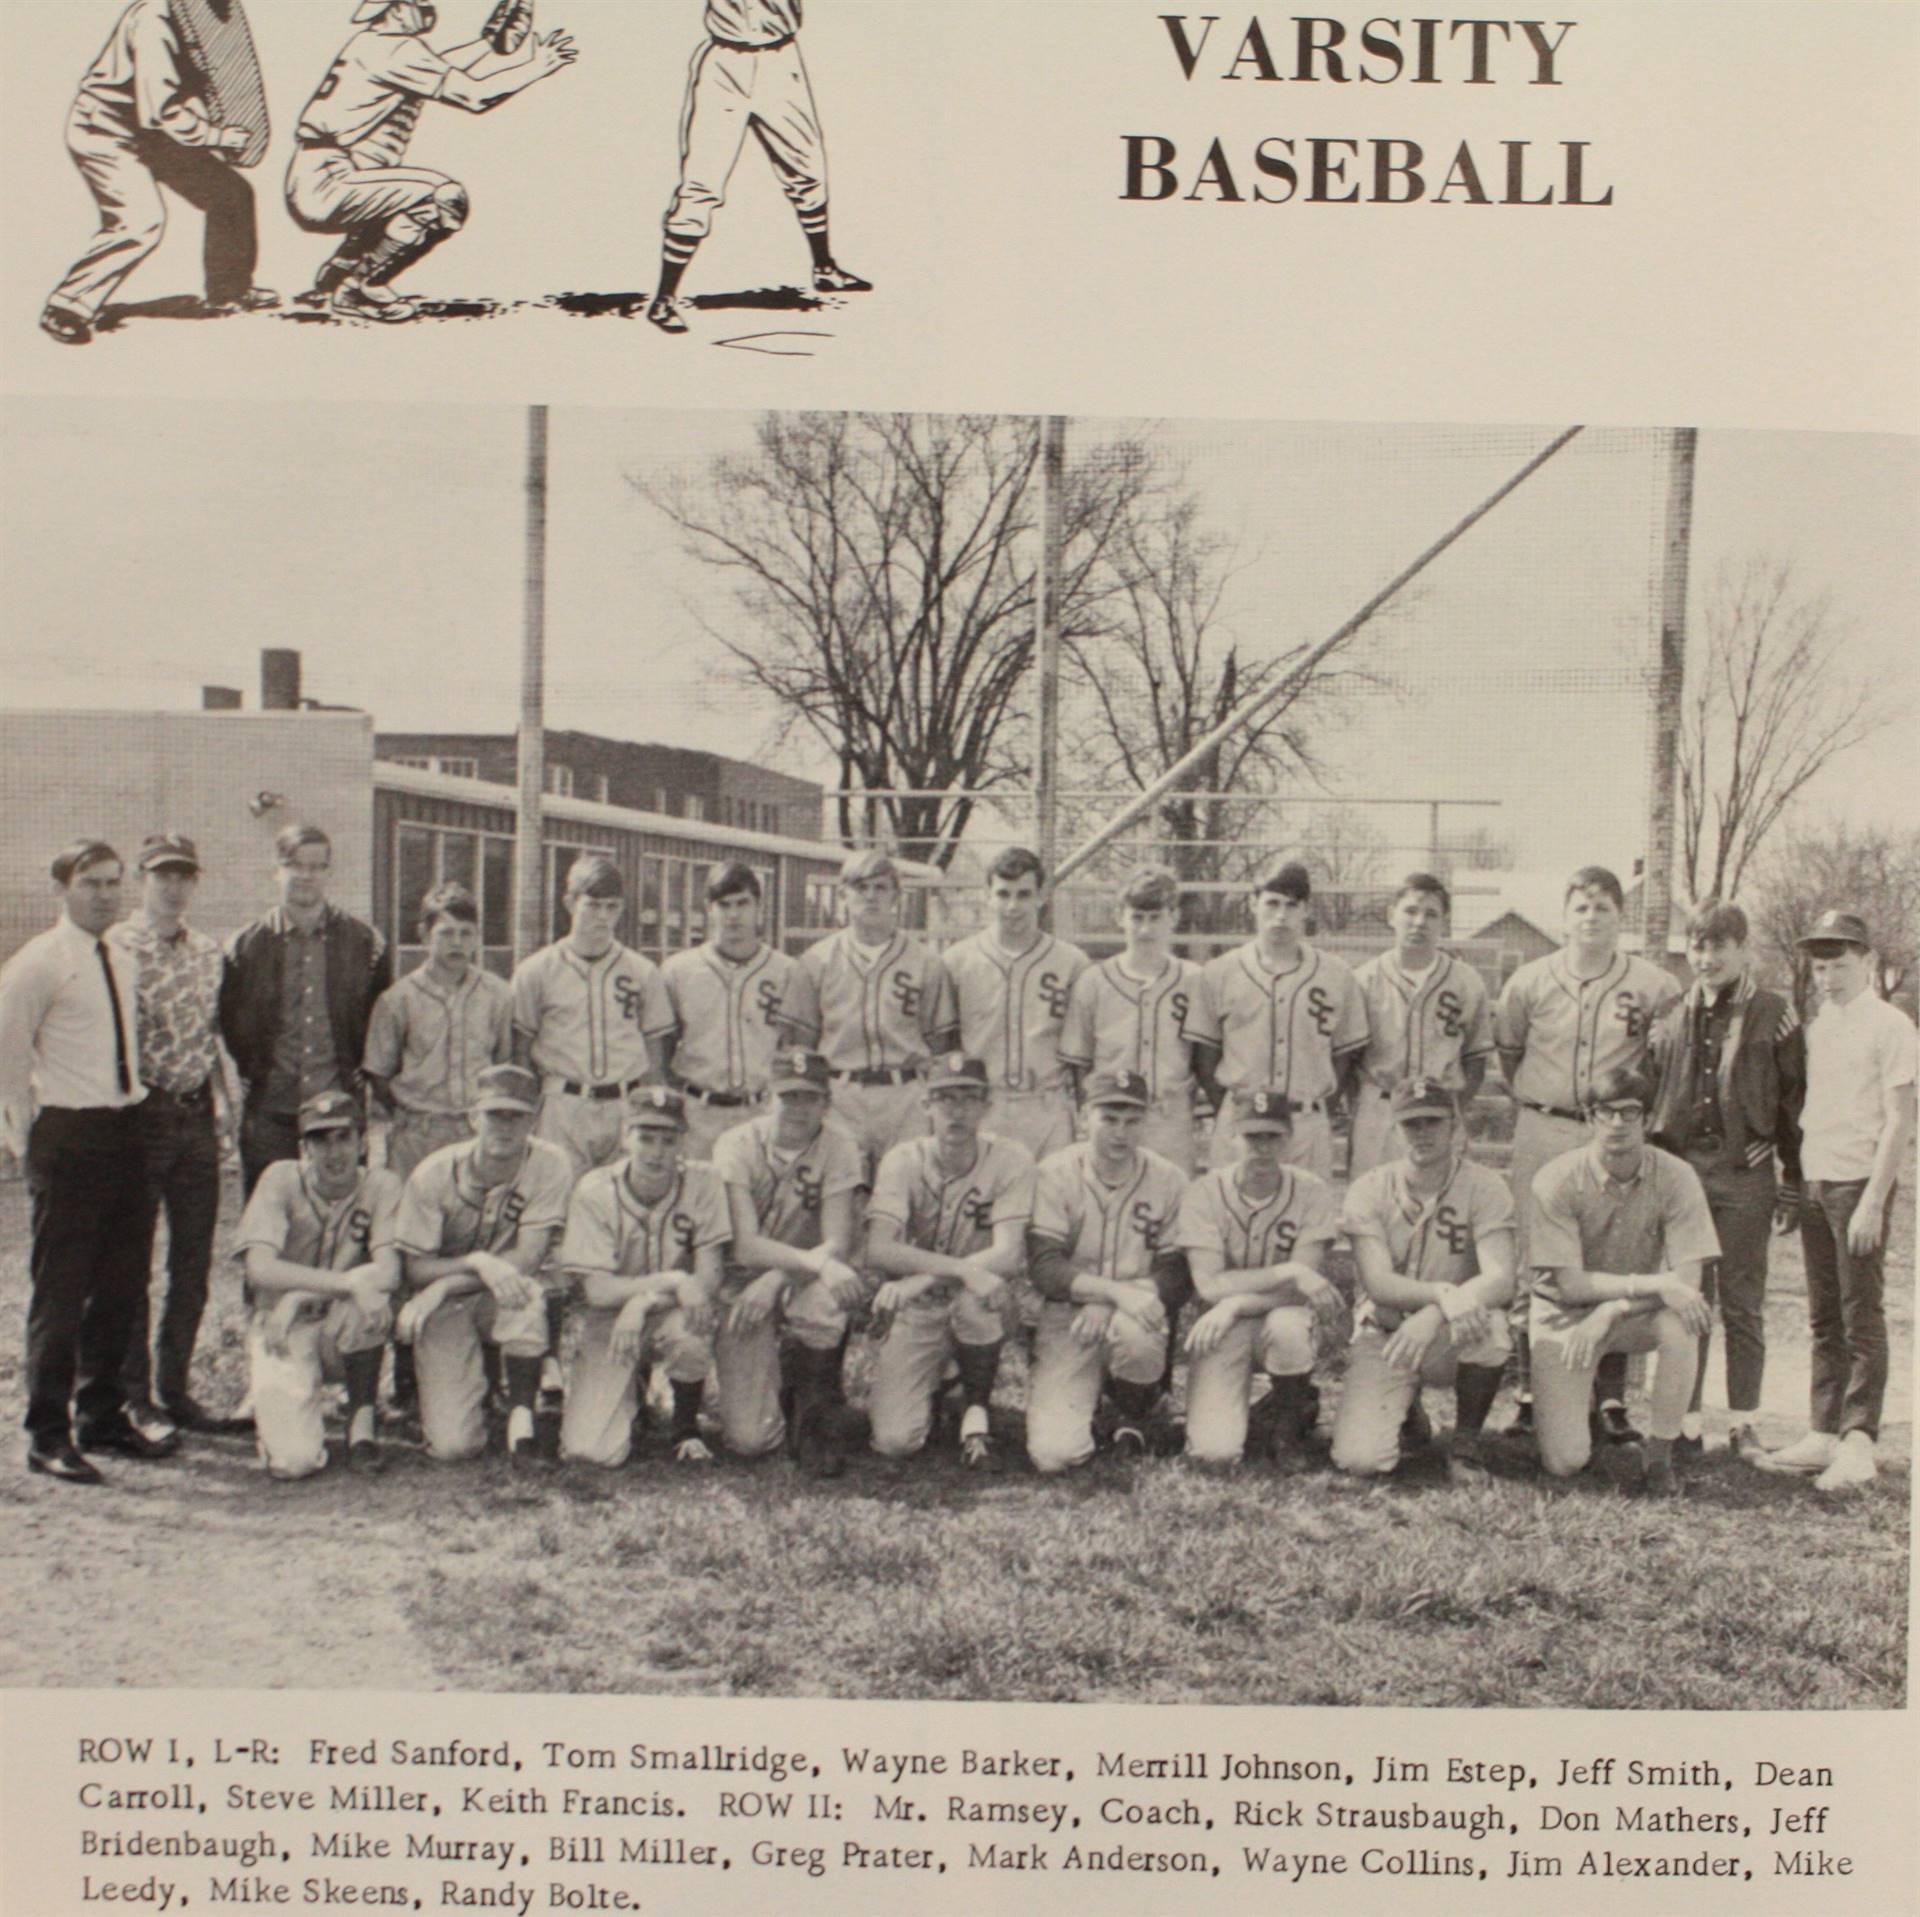 1969 Varsity Baseball